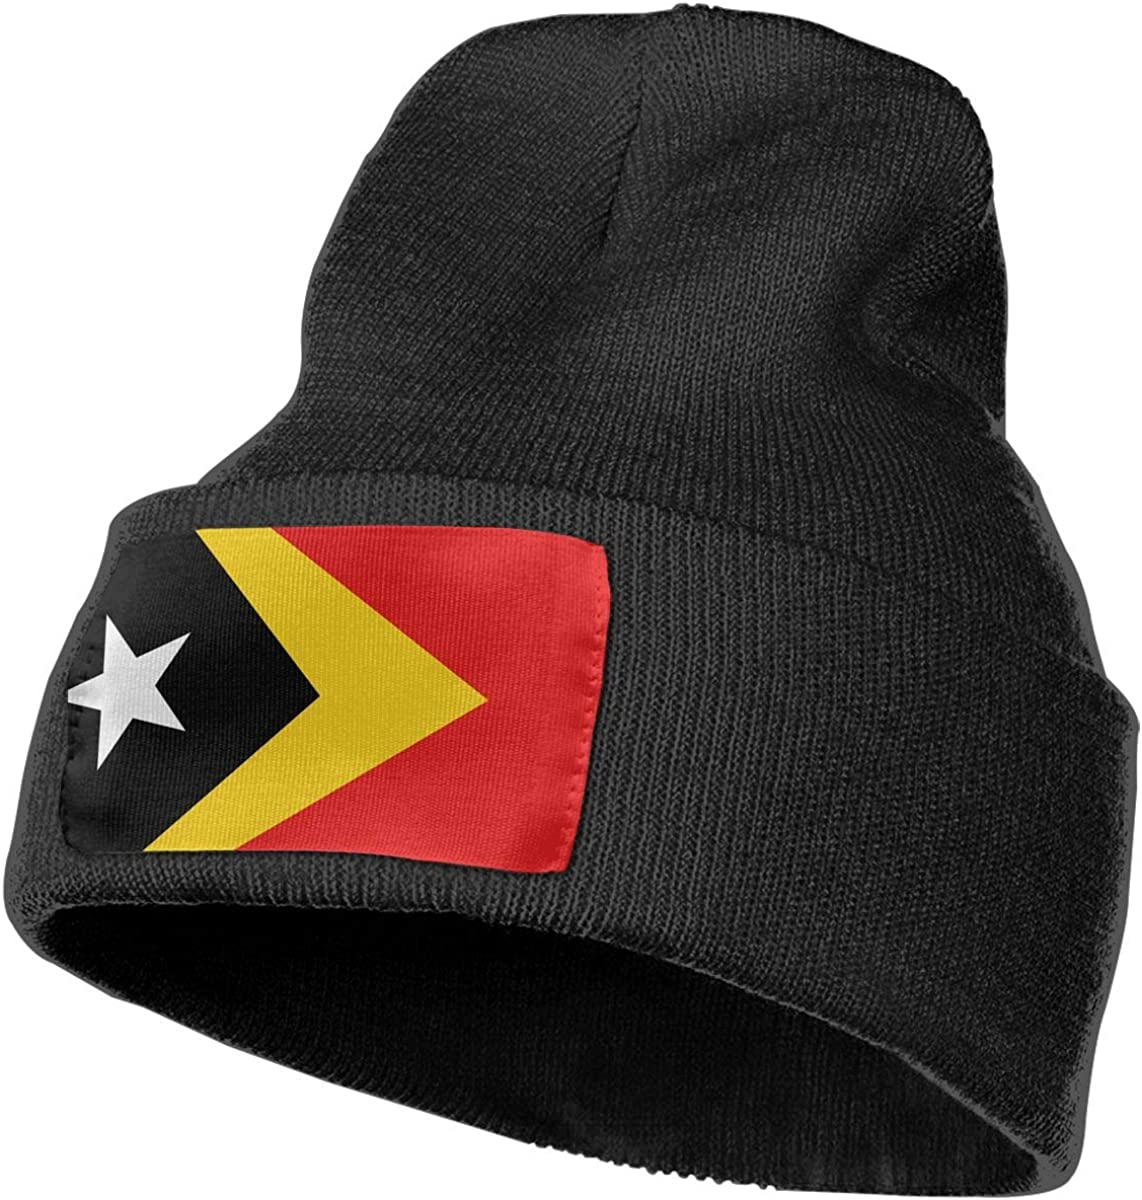 100/% Acrylic Acid Mas Beanie Hat Ruin Puerto Rico Flag Fashion Knitting Hat for Men Women